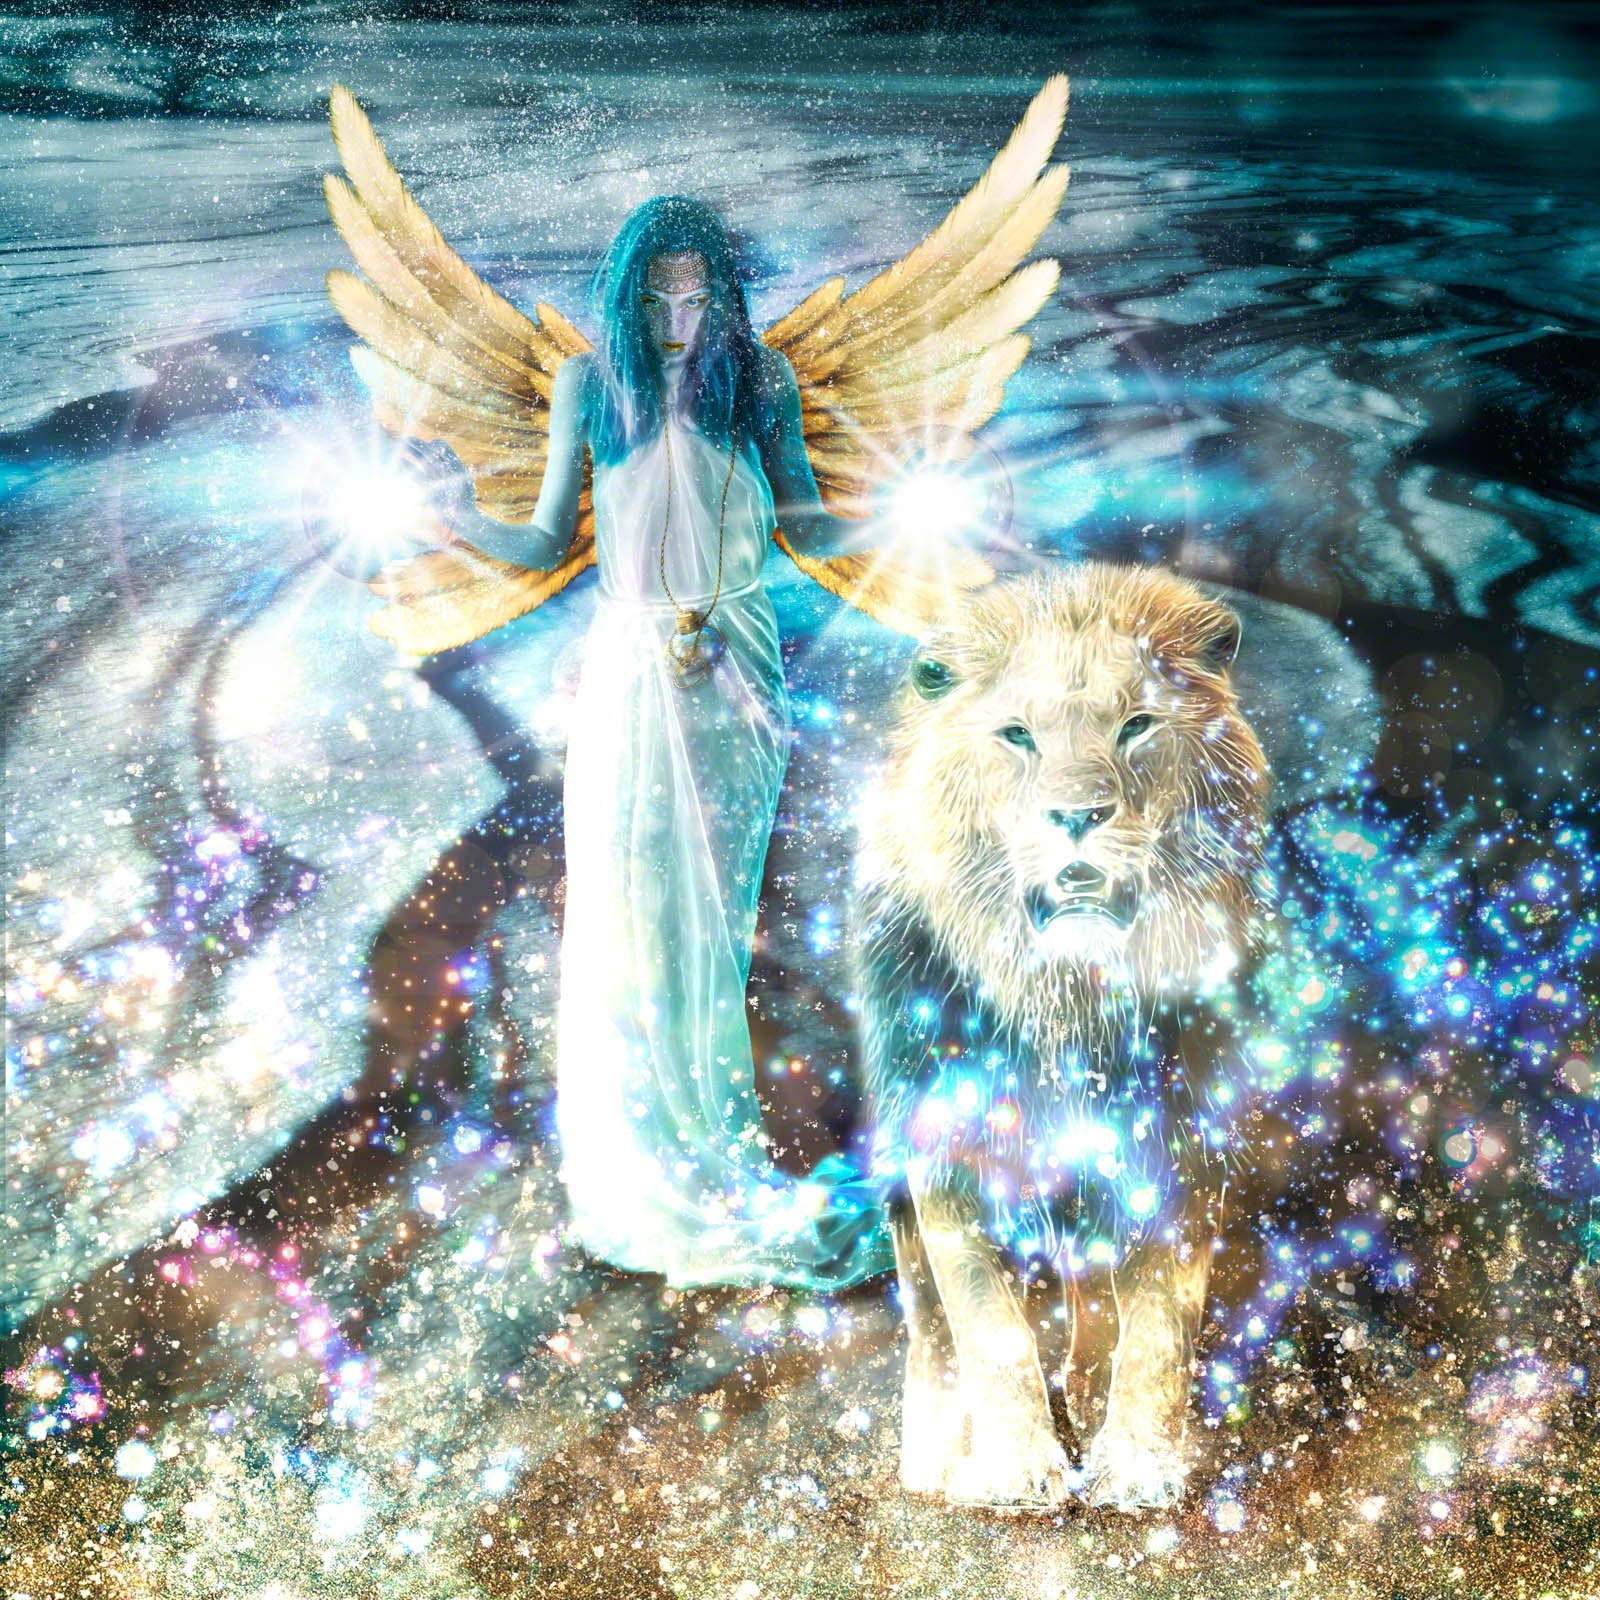 Digital Art: Lion